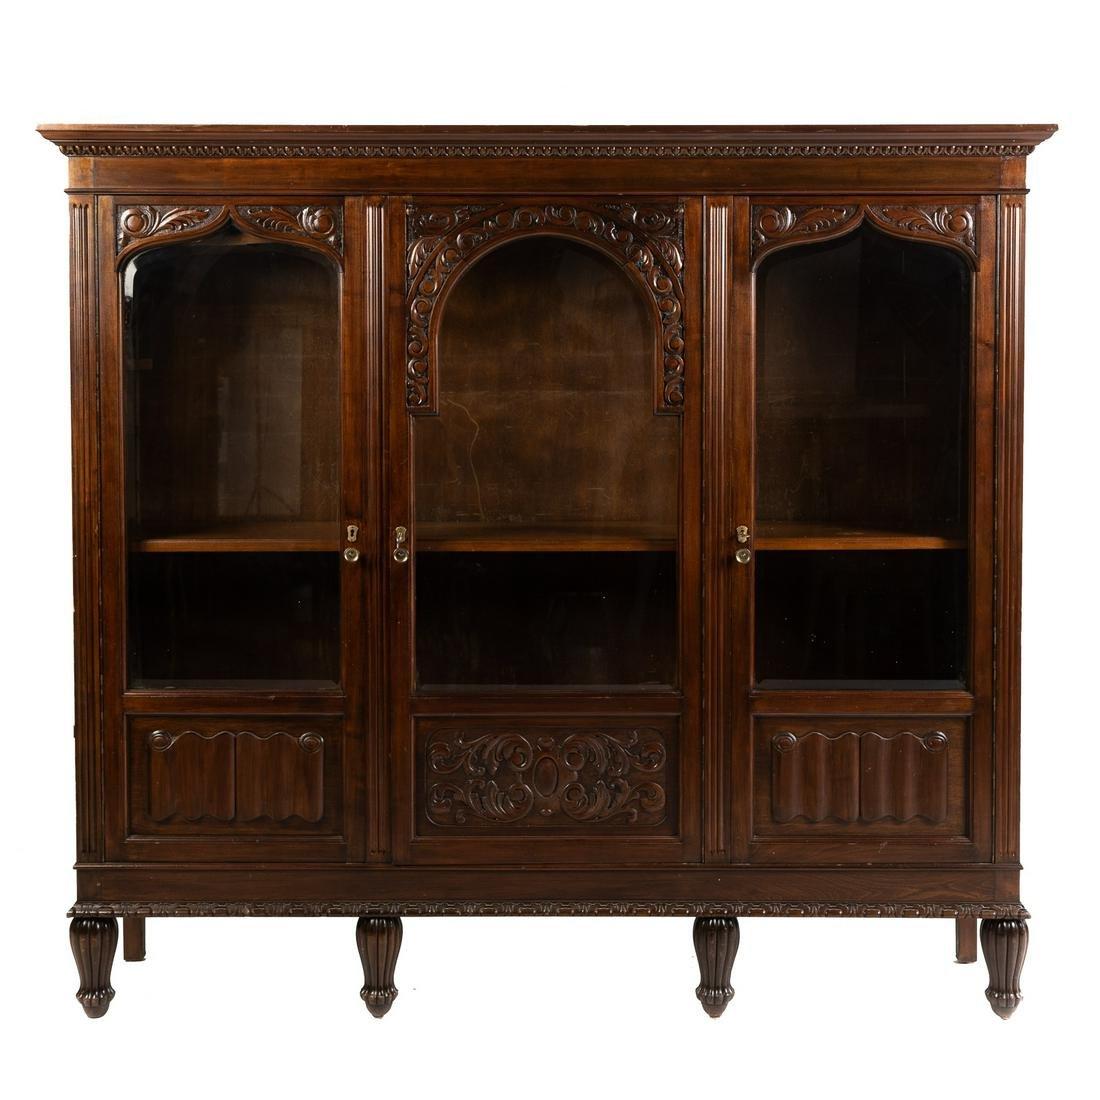 Victorian Elizabethan Revival Walnut Bookcase